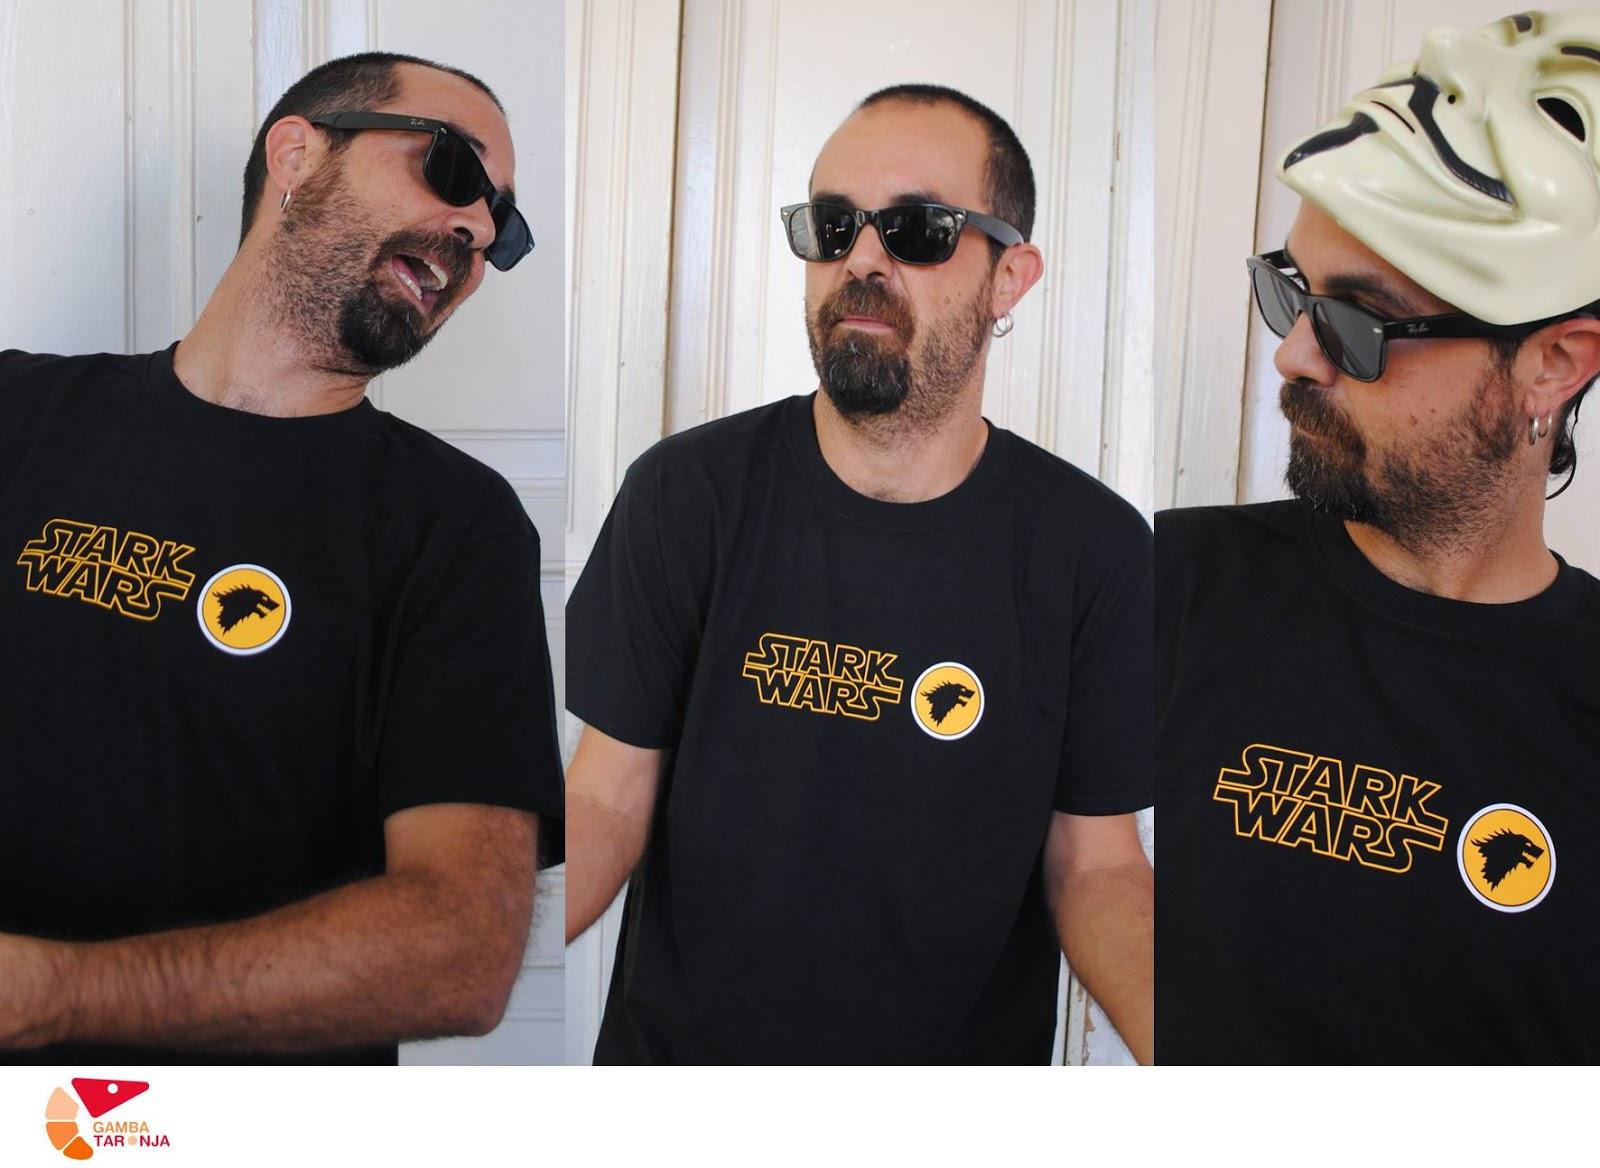 https://www.gambataronja.com/es/camisetas/21-stark-wars.html